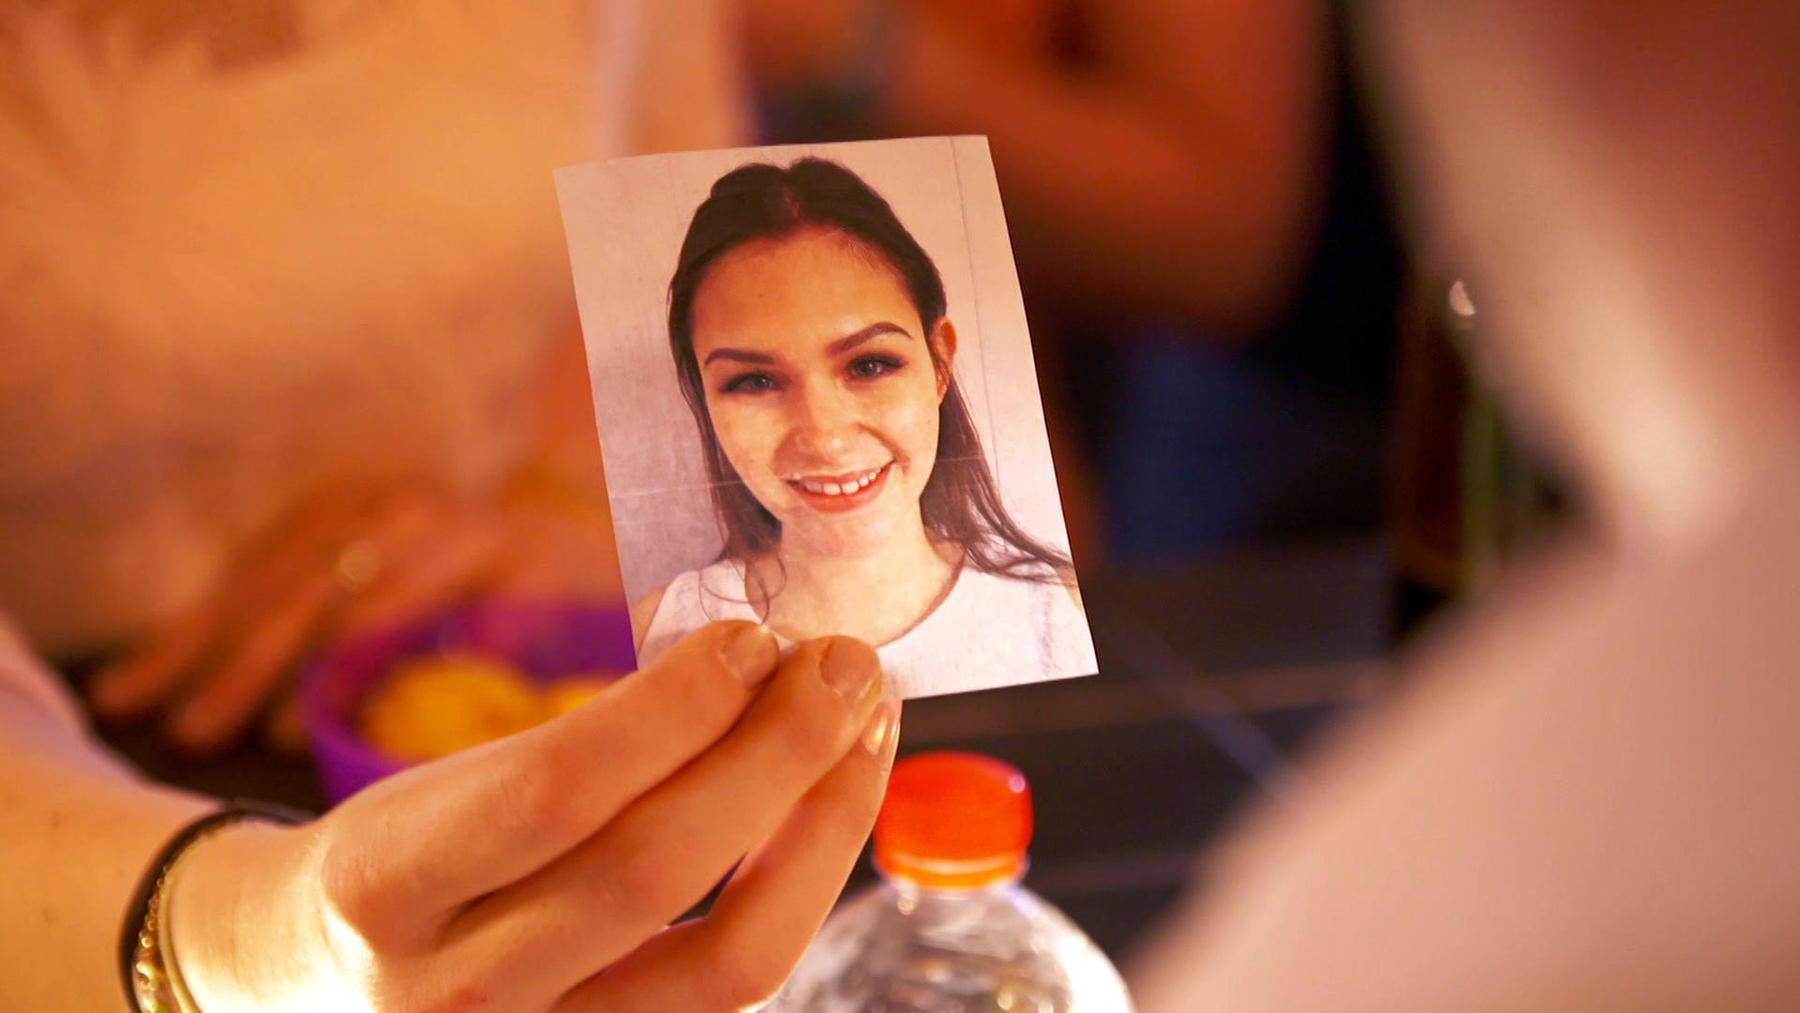 Mallorca-Mädchen vermisst (182)   Folge 7